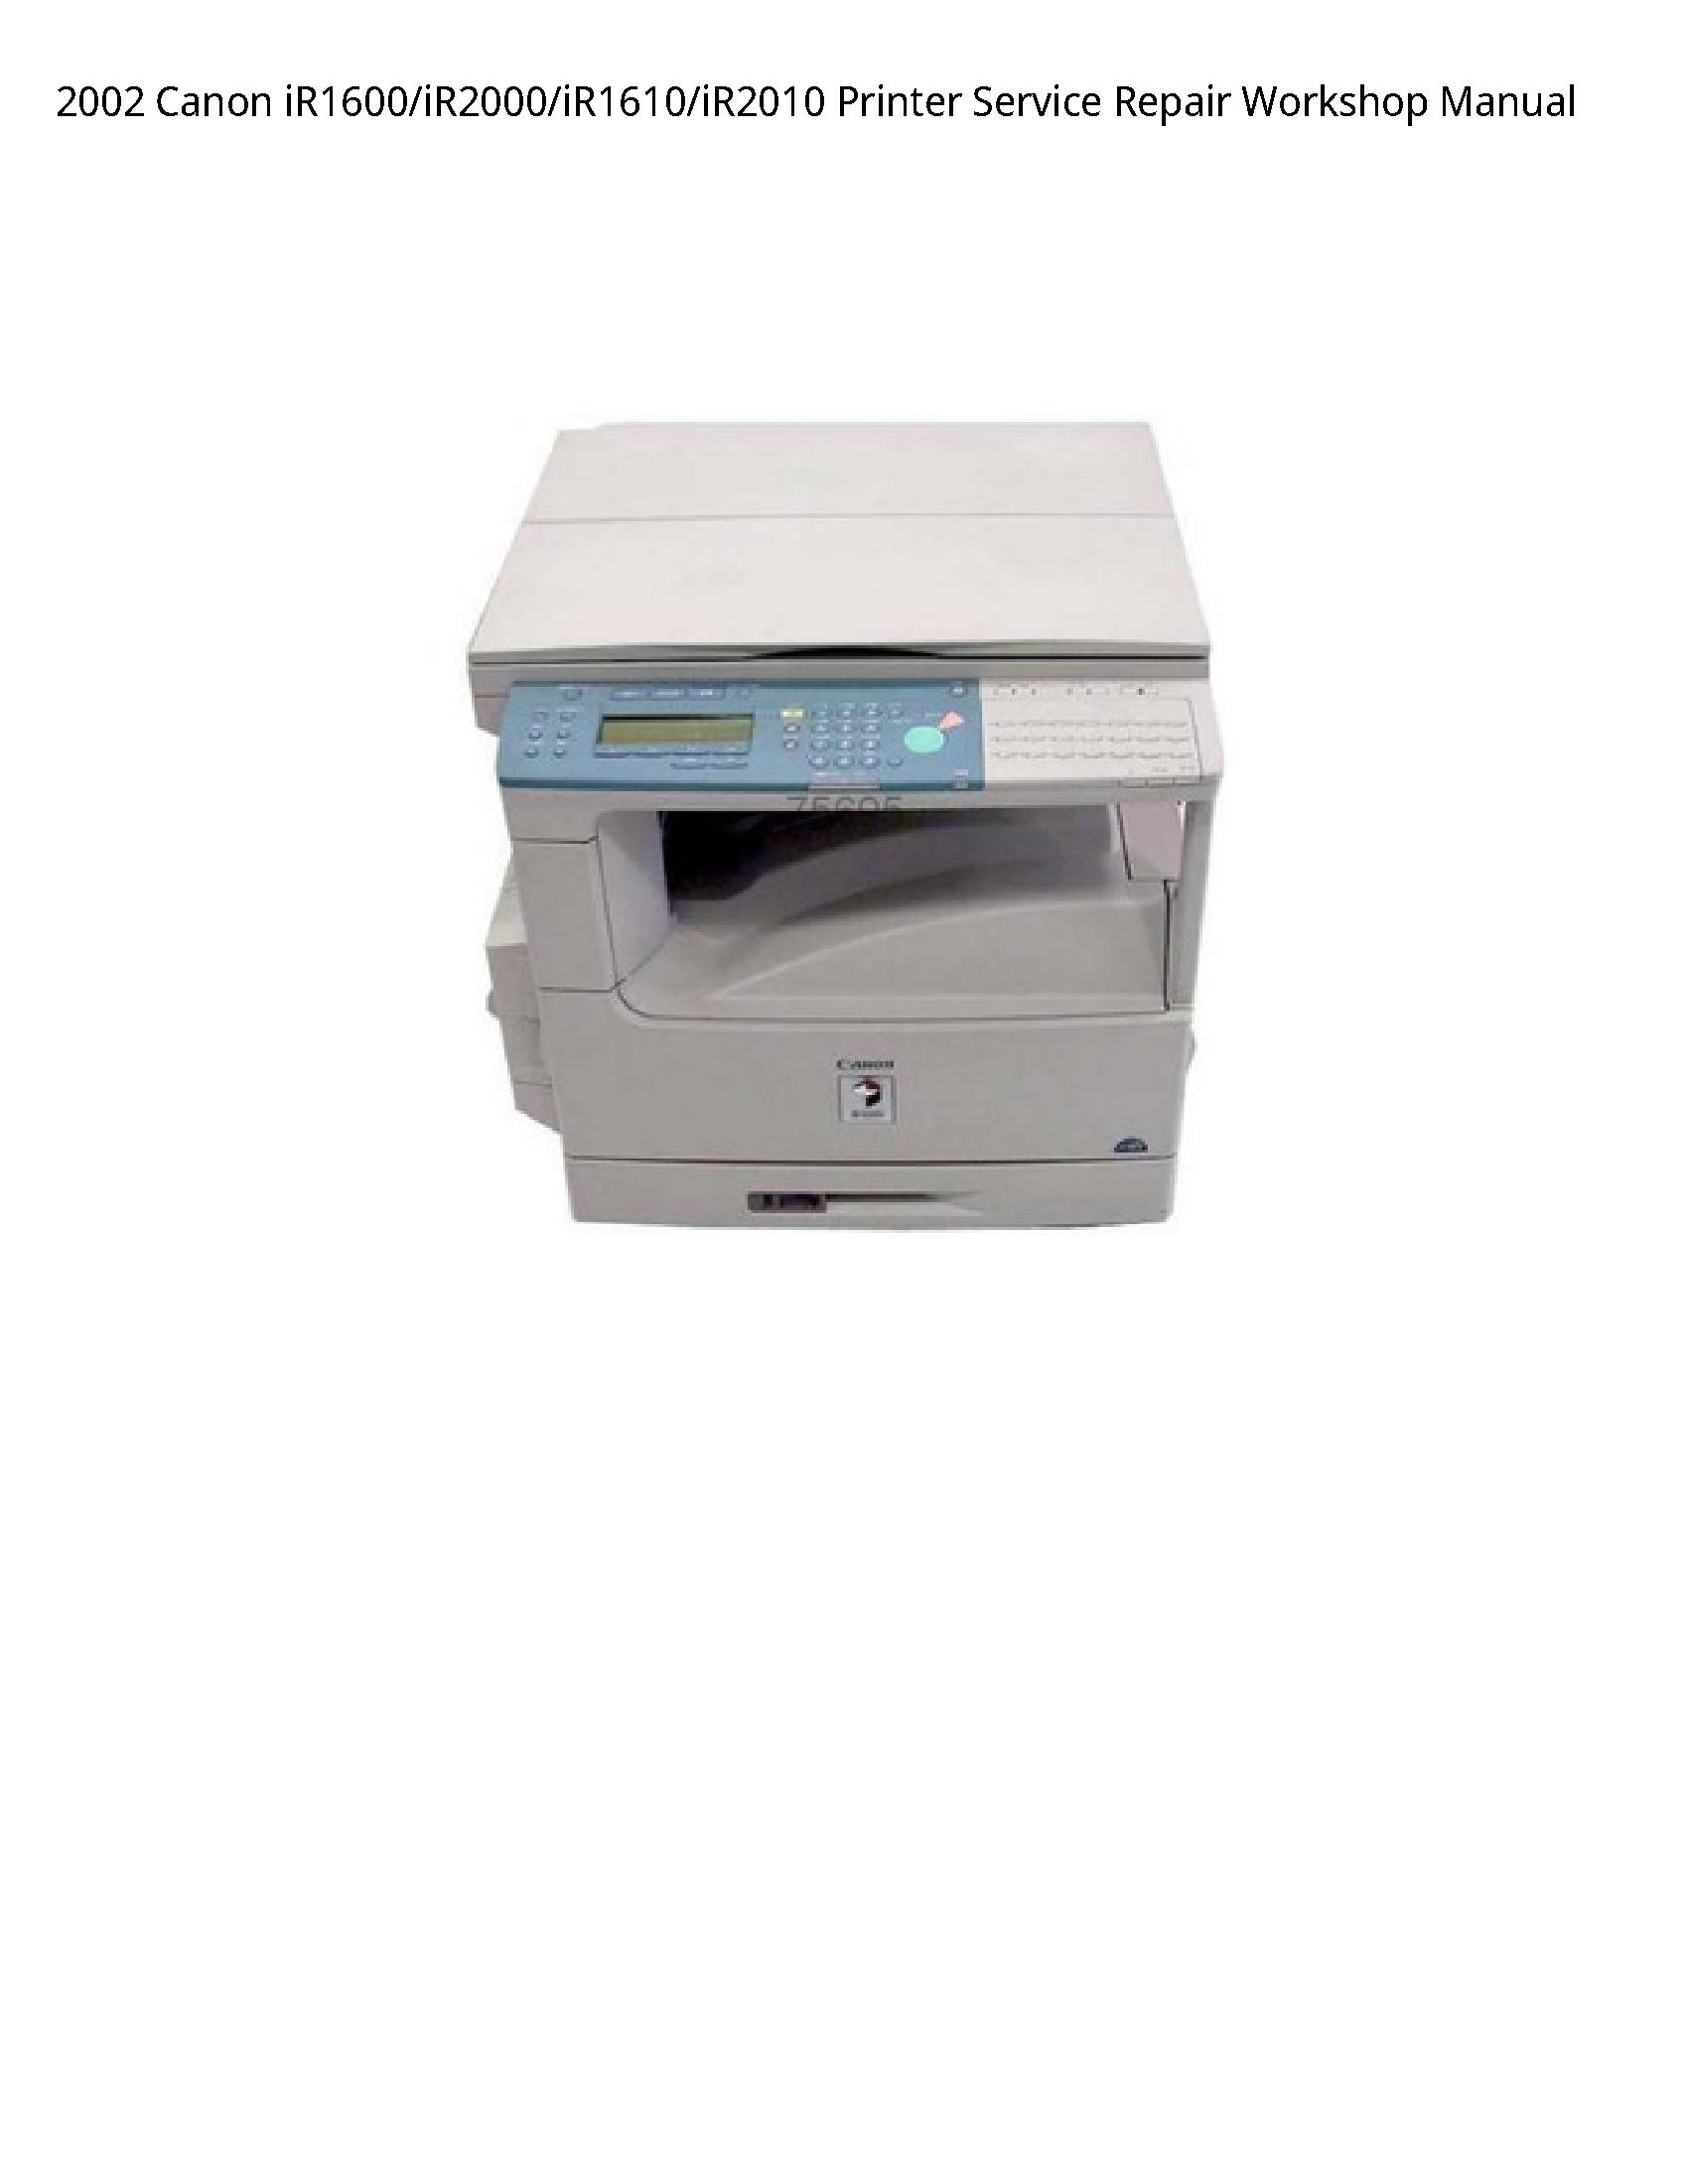 Canon iR1600 Printer manual